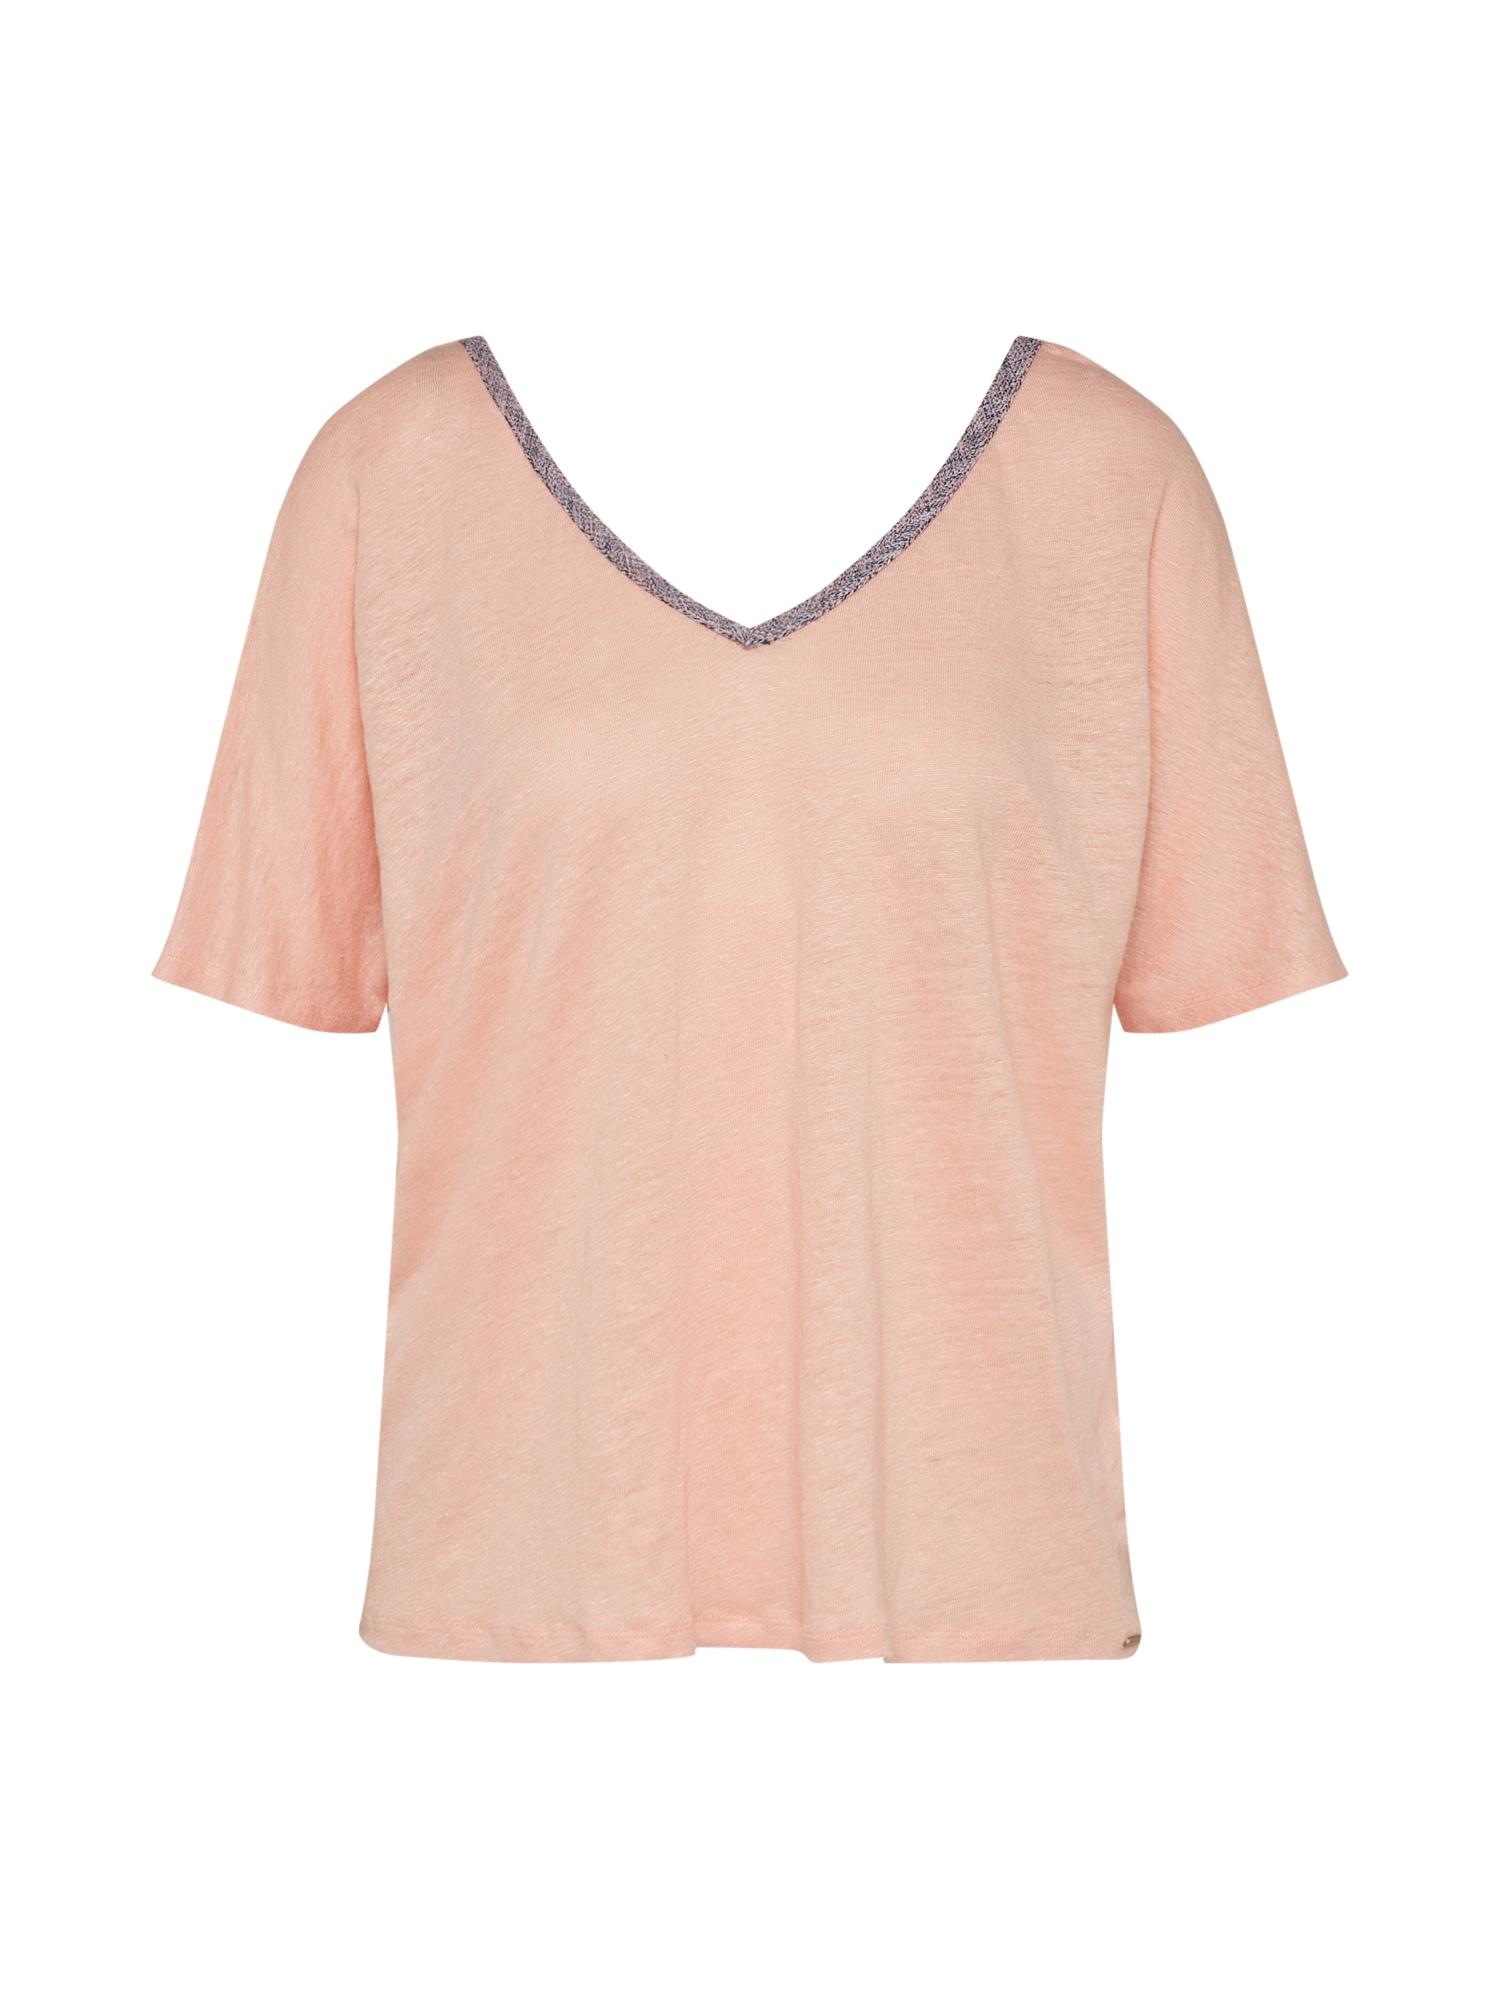 Pepe Jeans Dames Shirt rosa